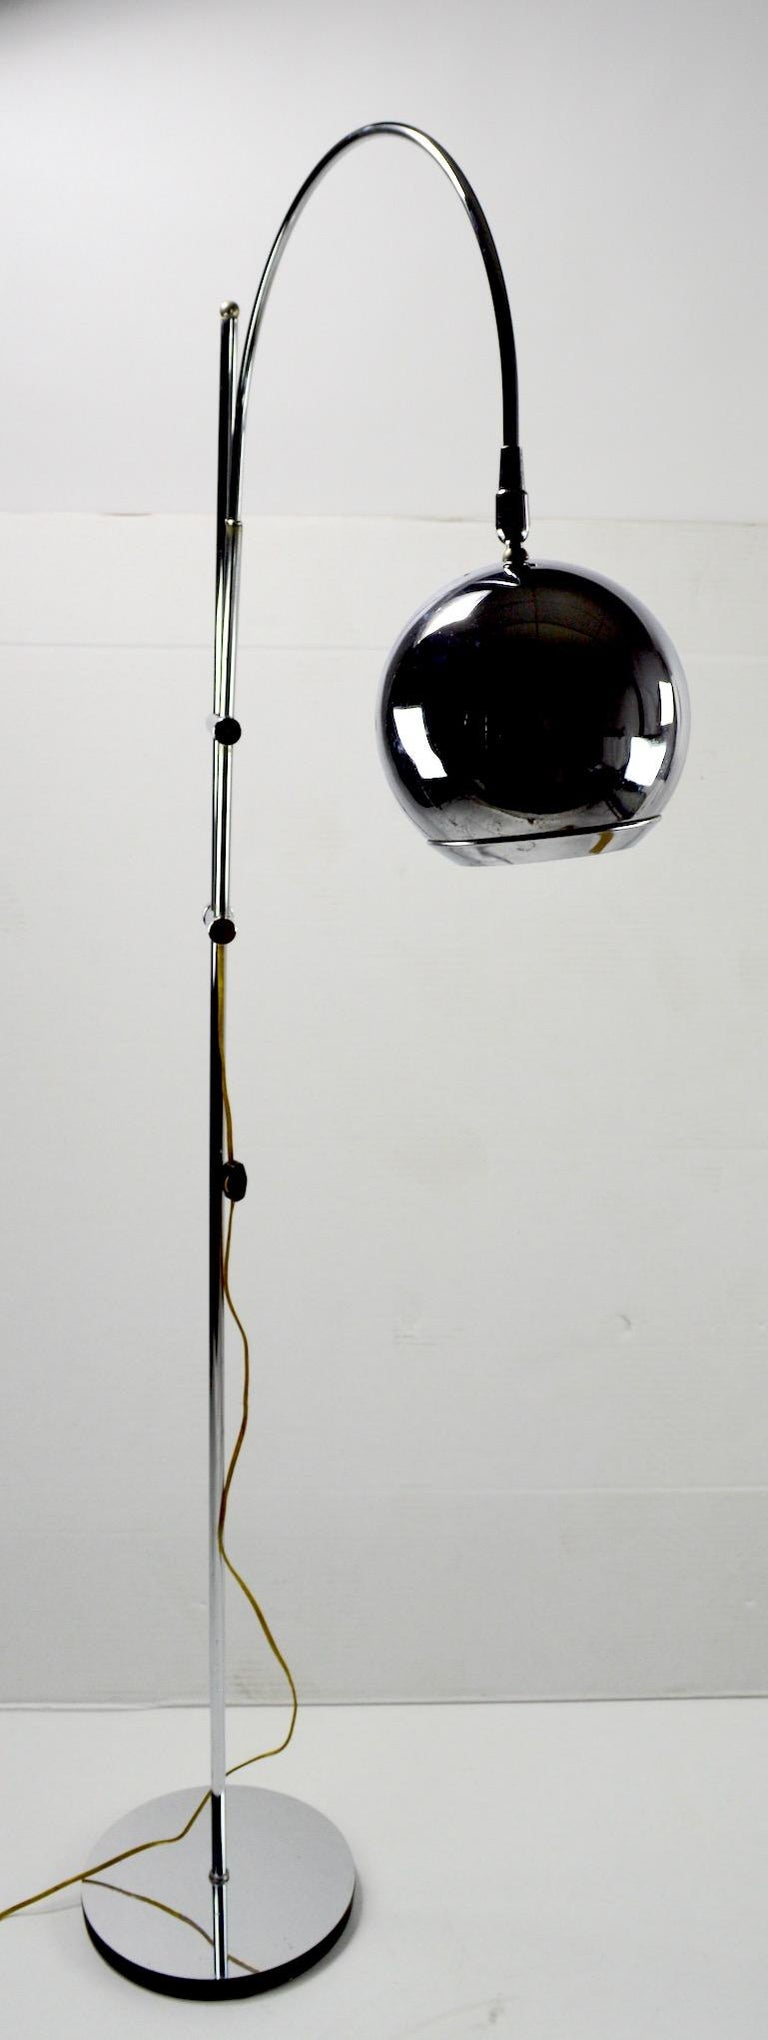 Adjustable Chrome Arc Lamp with Eyeball Shade For Sale 6